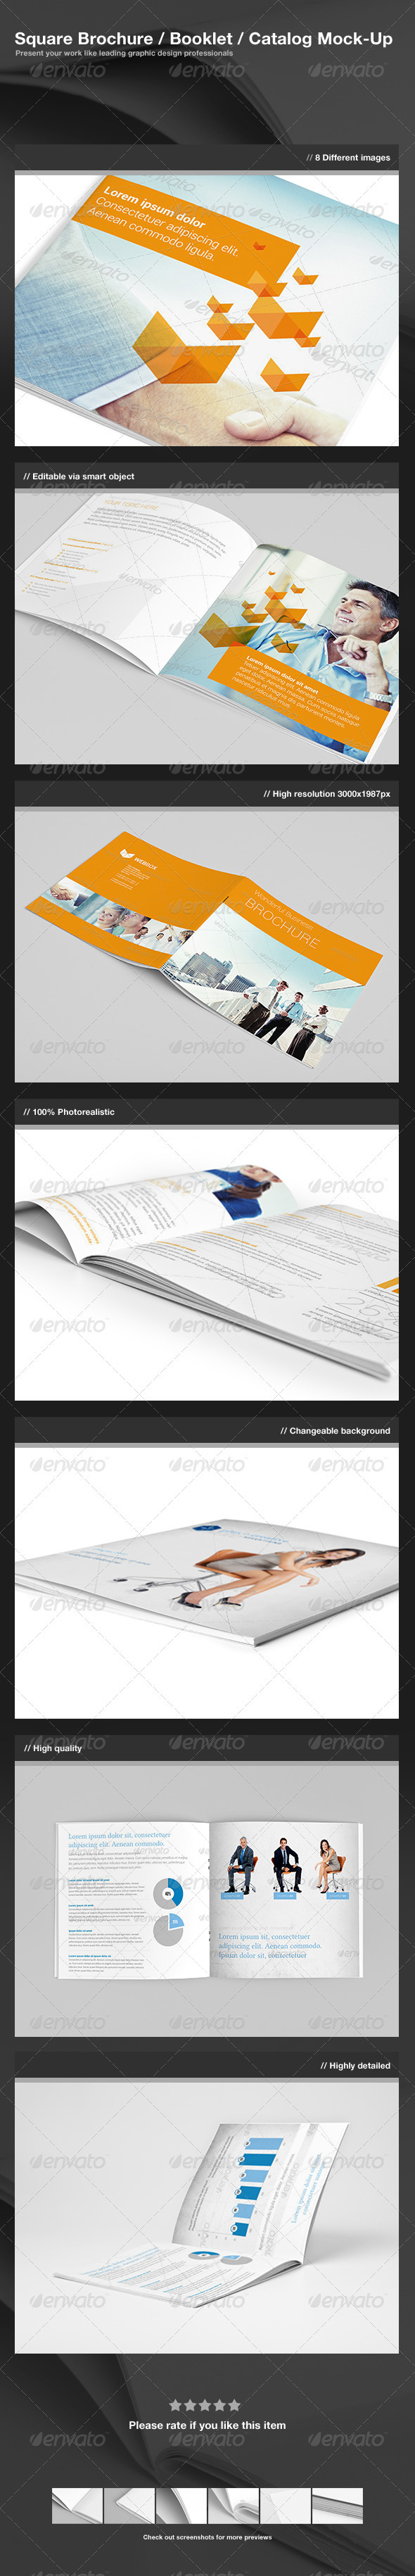 GraphicRiver Square Brochure Booklet Catalog Mock-Up 3019036